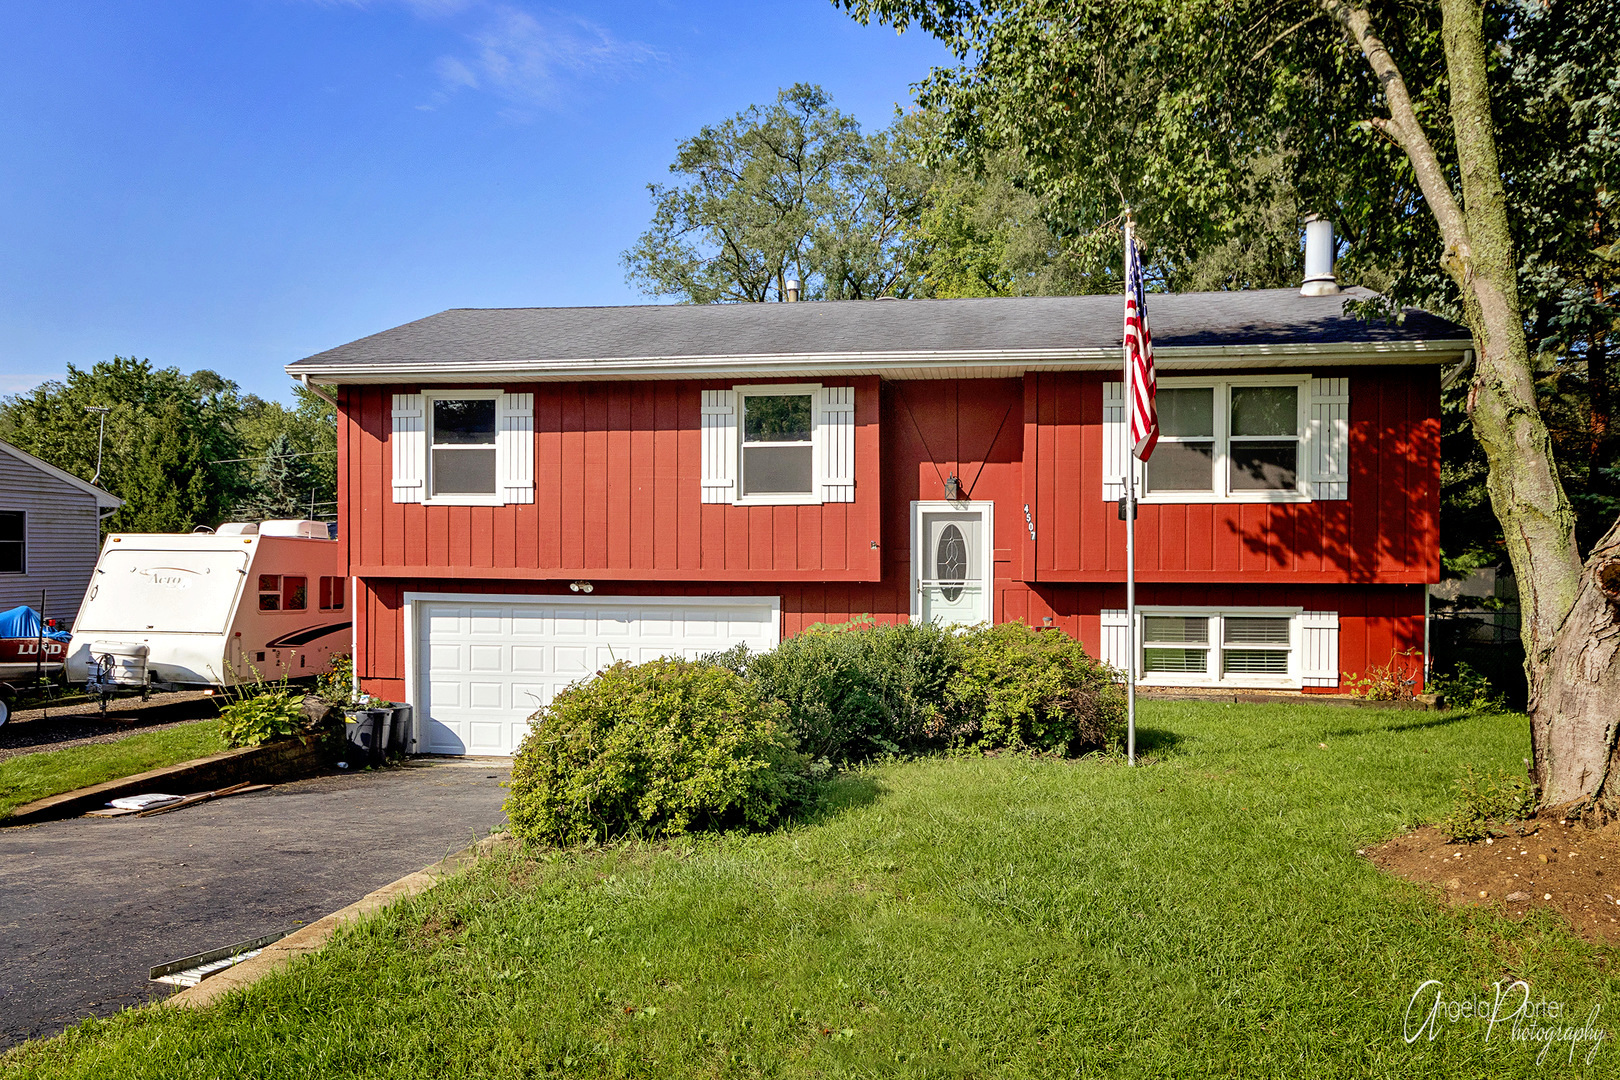 4507 Poplarleaf ,Mchenry, Illinois 60051